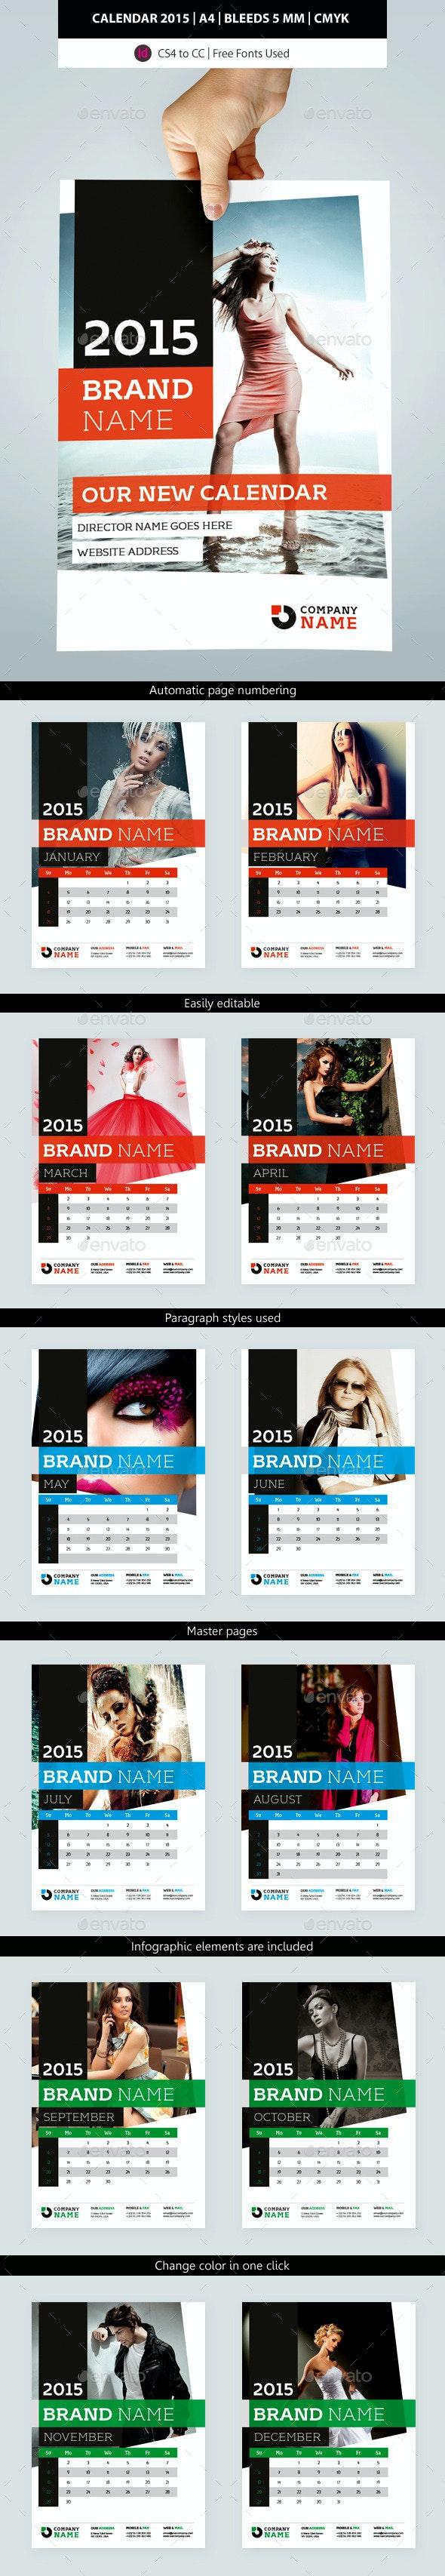 2015 Wall Calendar Template Design - Calendars Stationery